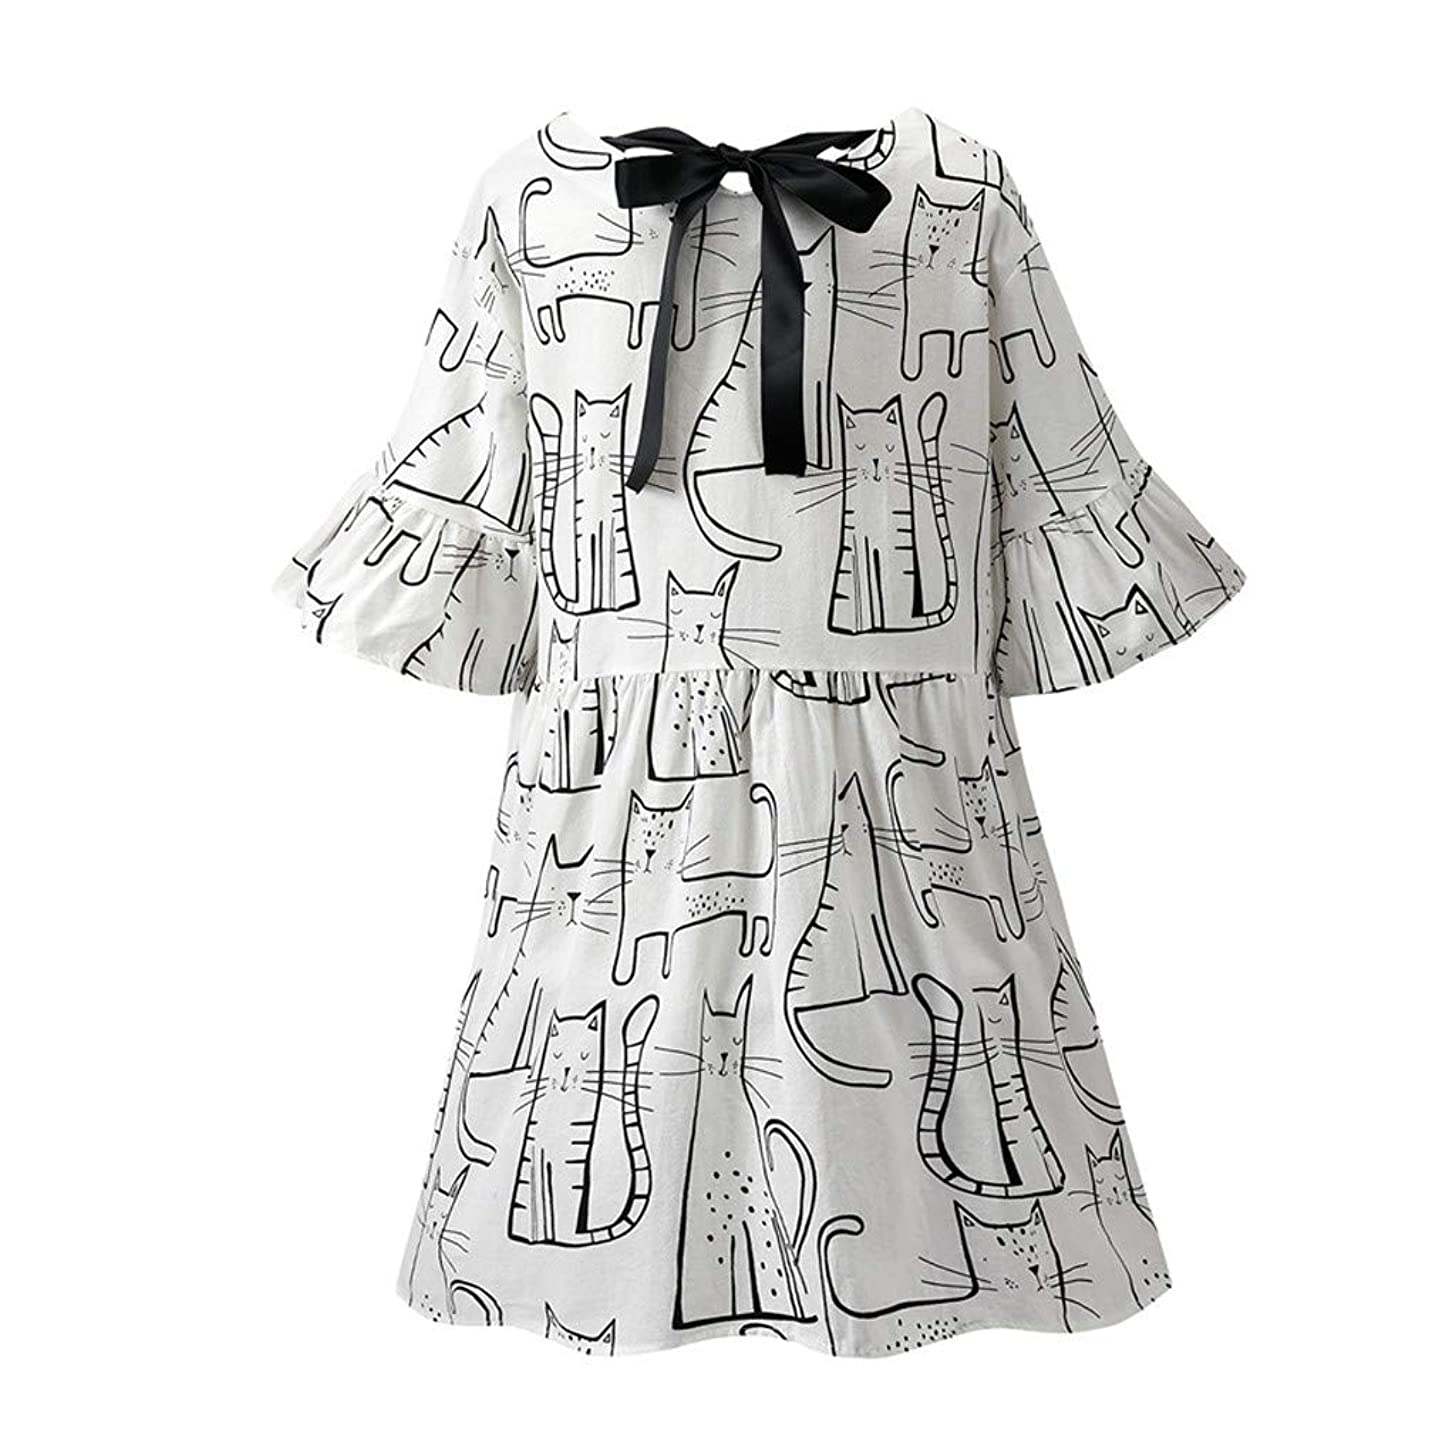 LONGDAY Women Summer Dress Cotton Linen T-Shirt Crew Neck Print Shirt Mini Dress Plus Size Comfy Top Swing Loose Blouse